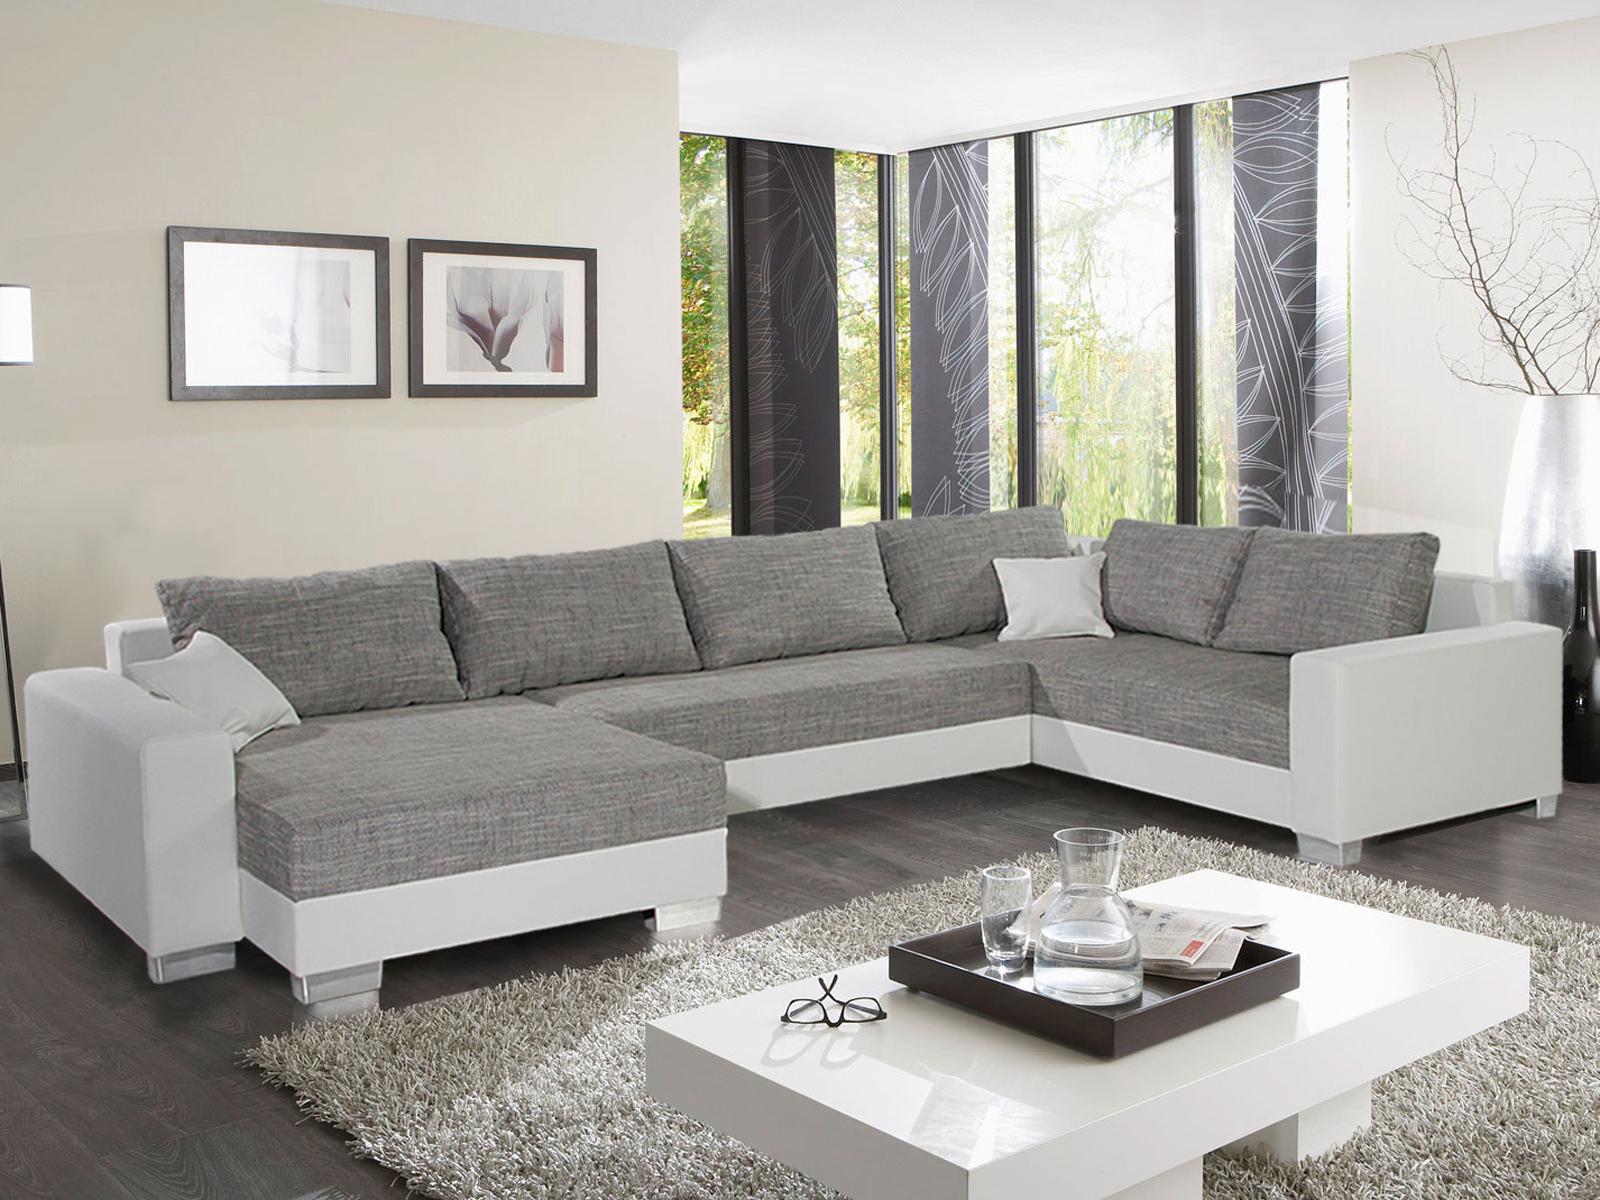 Wohnlandschaft abby sofa ecksofa in schwarz wei grau - Braunes ecksofa ...